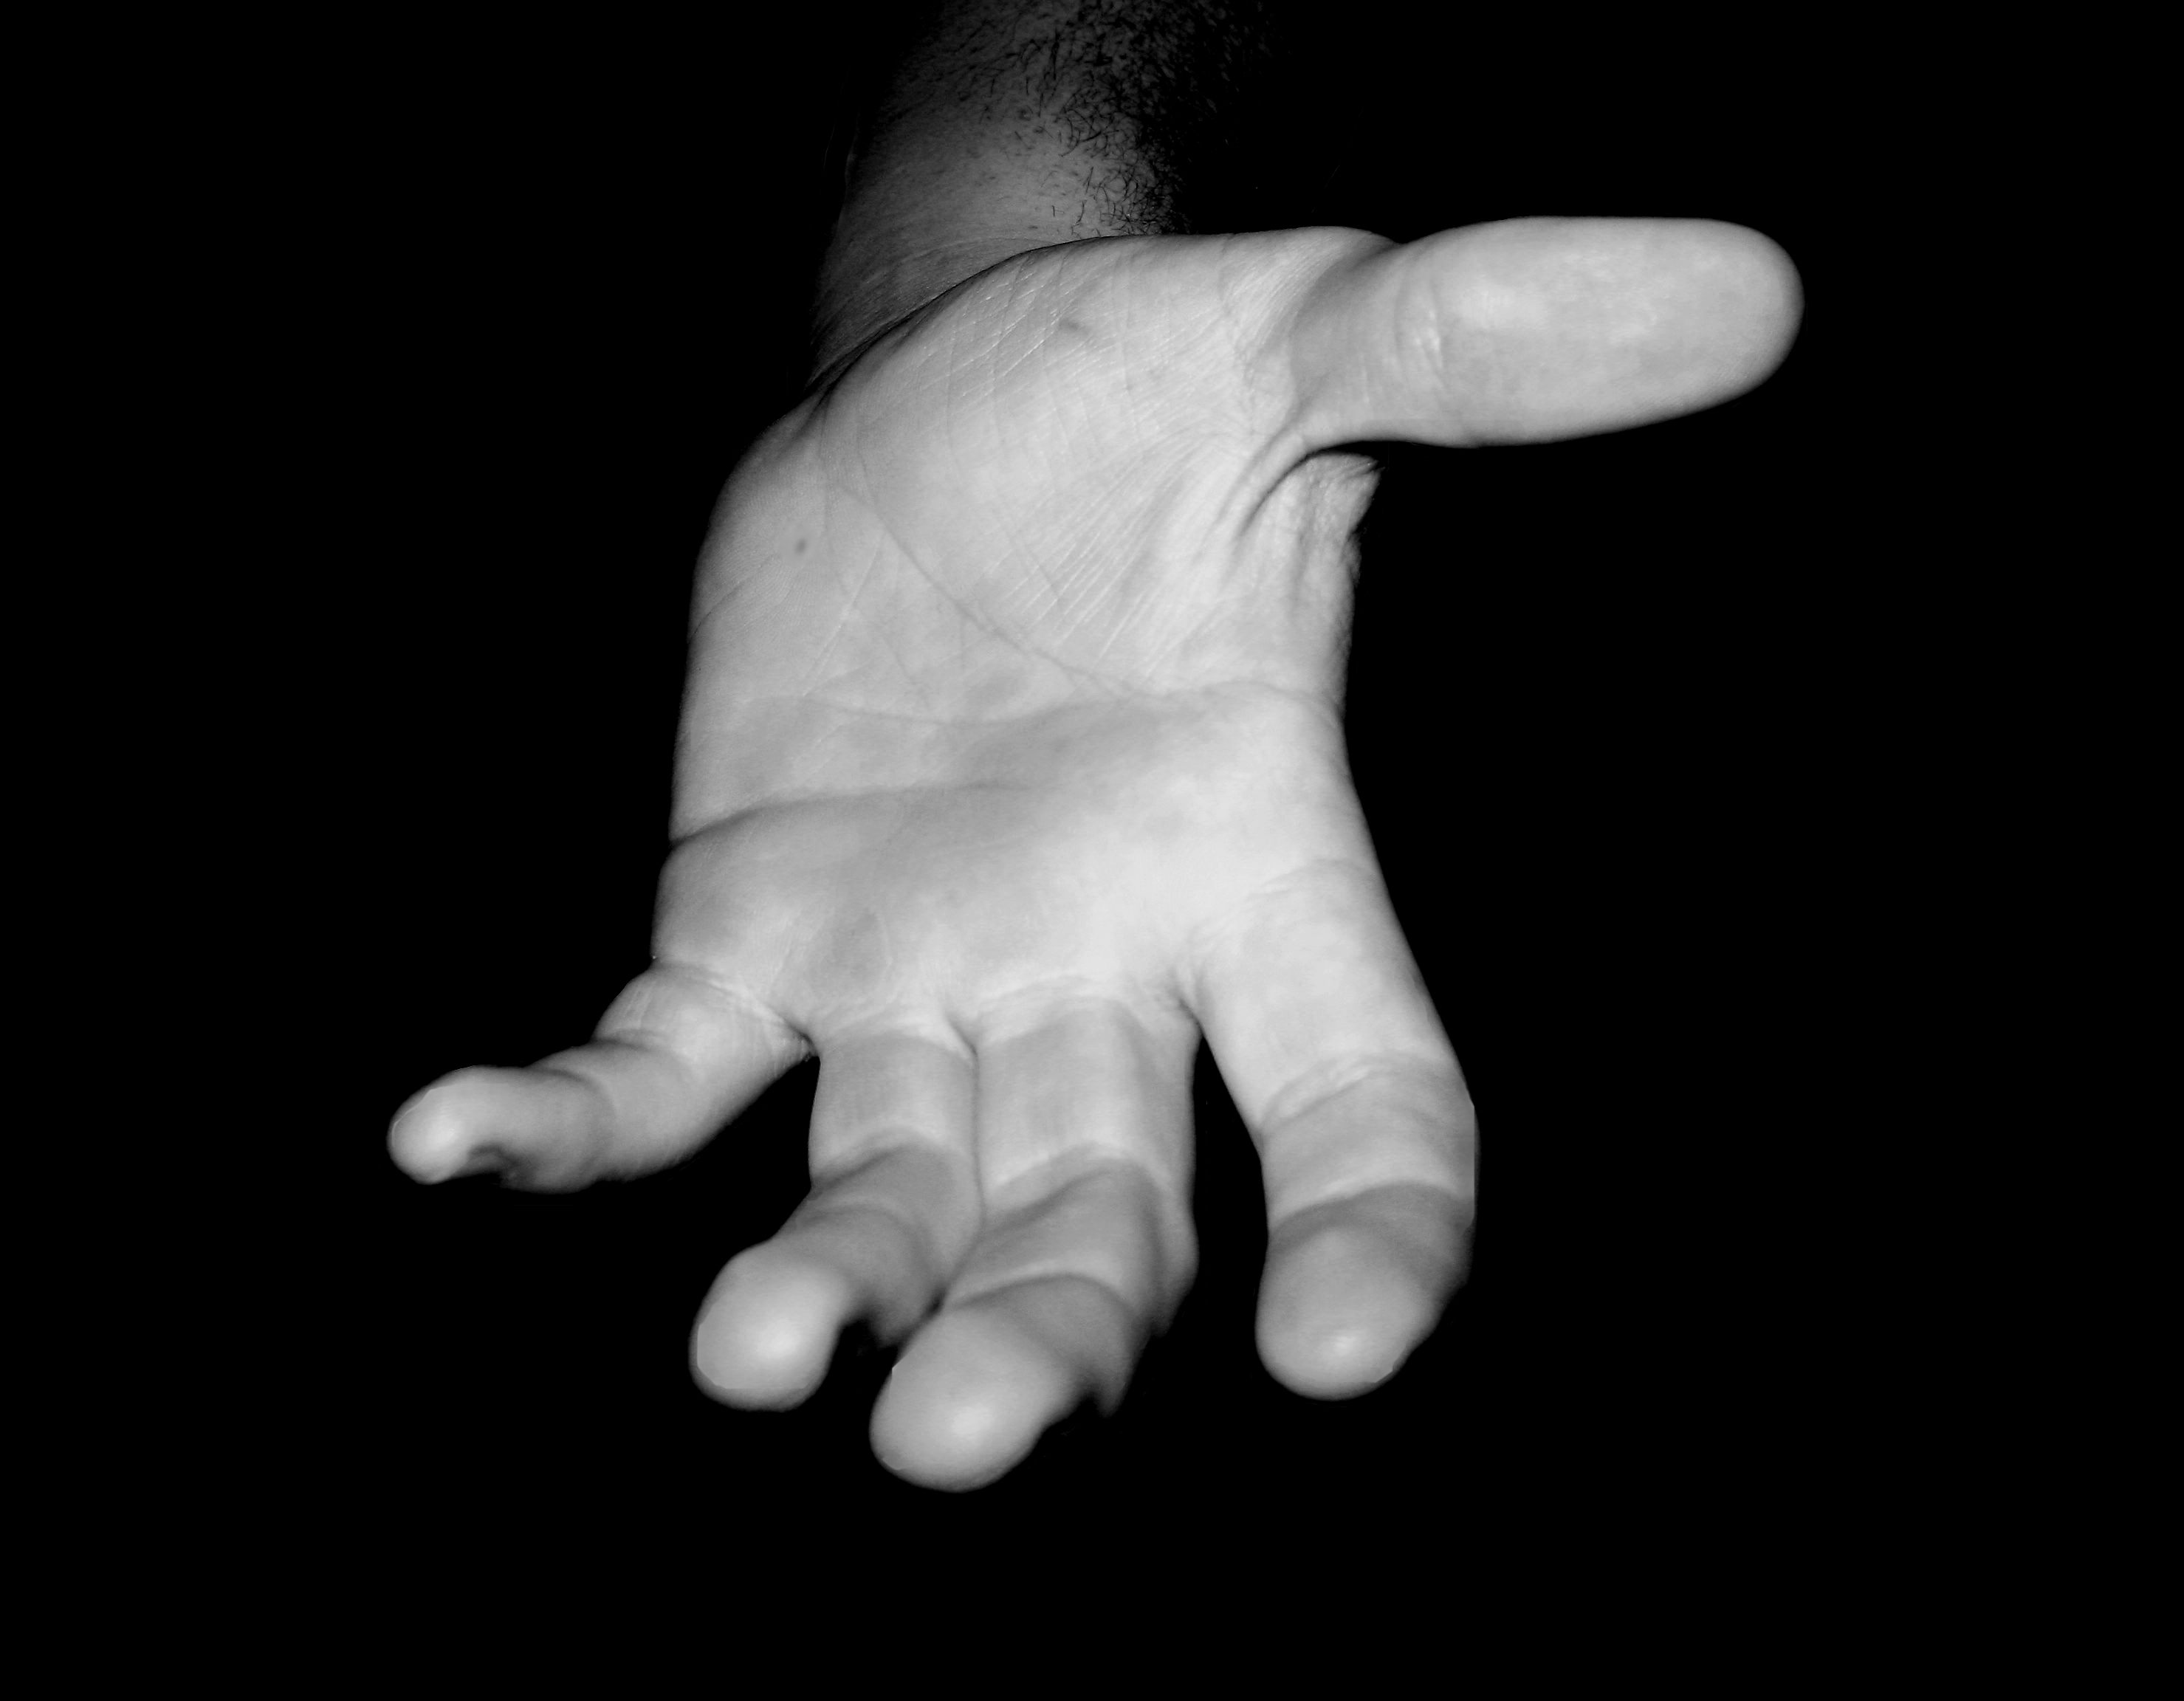 Дай мне свою руку фото